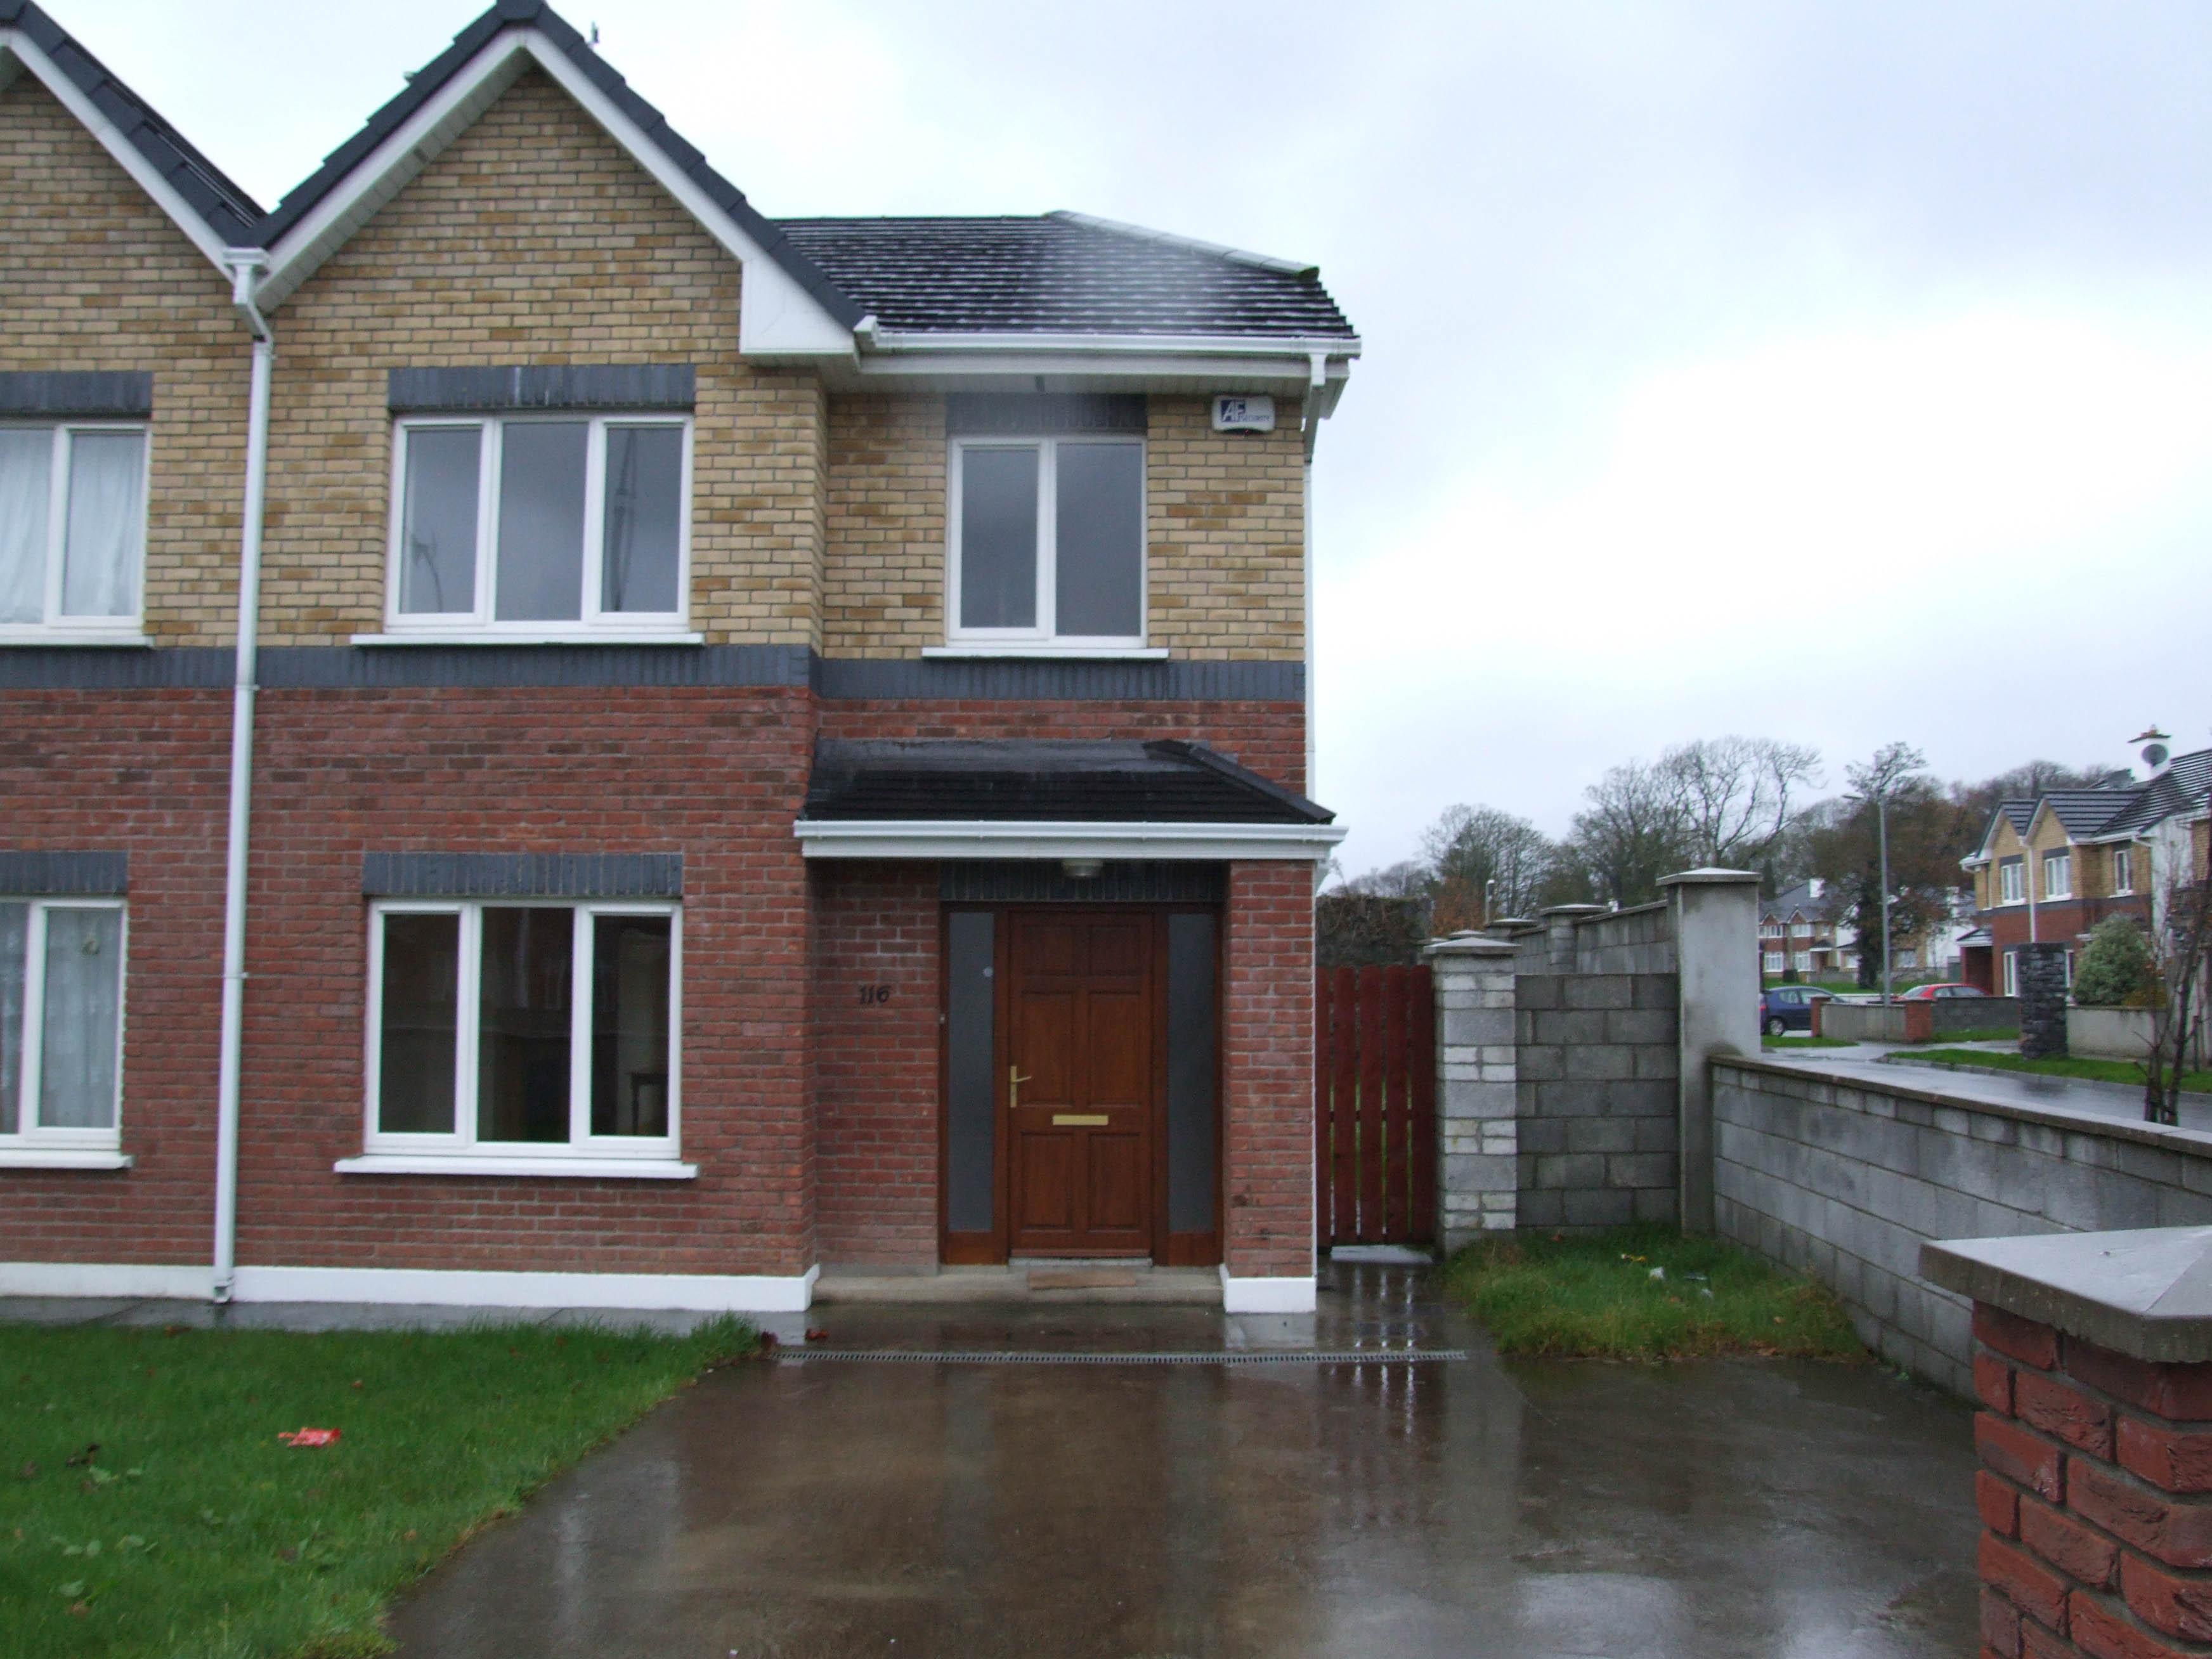 116 Killeen Wood, Oakpark, Tralee, Co. Kerry, V92 W2H2, Ireland